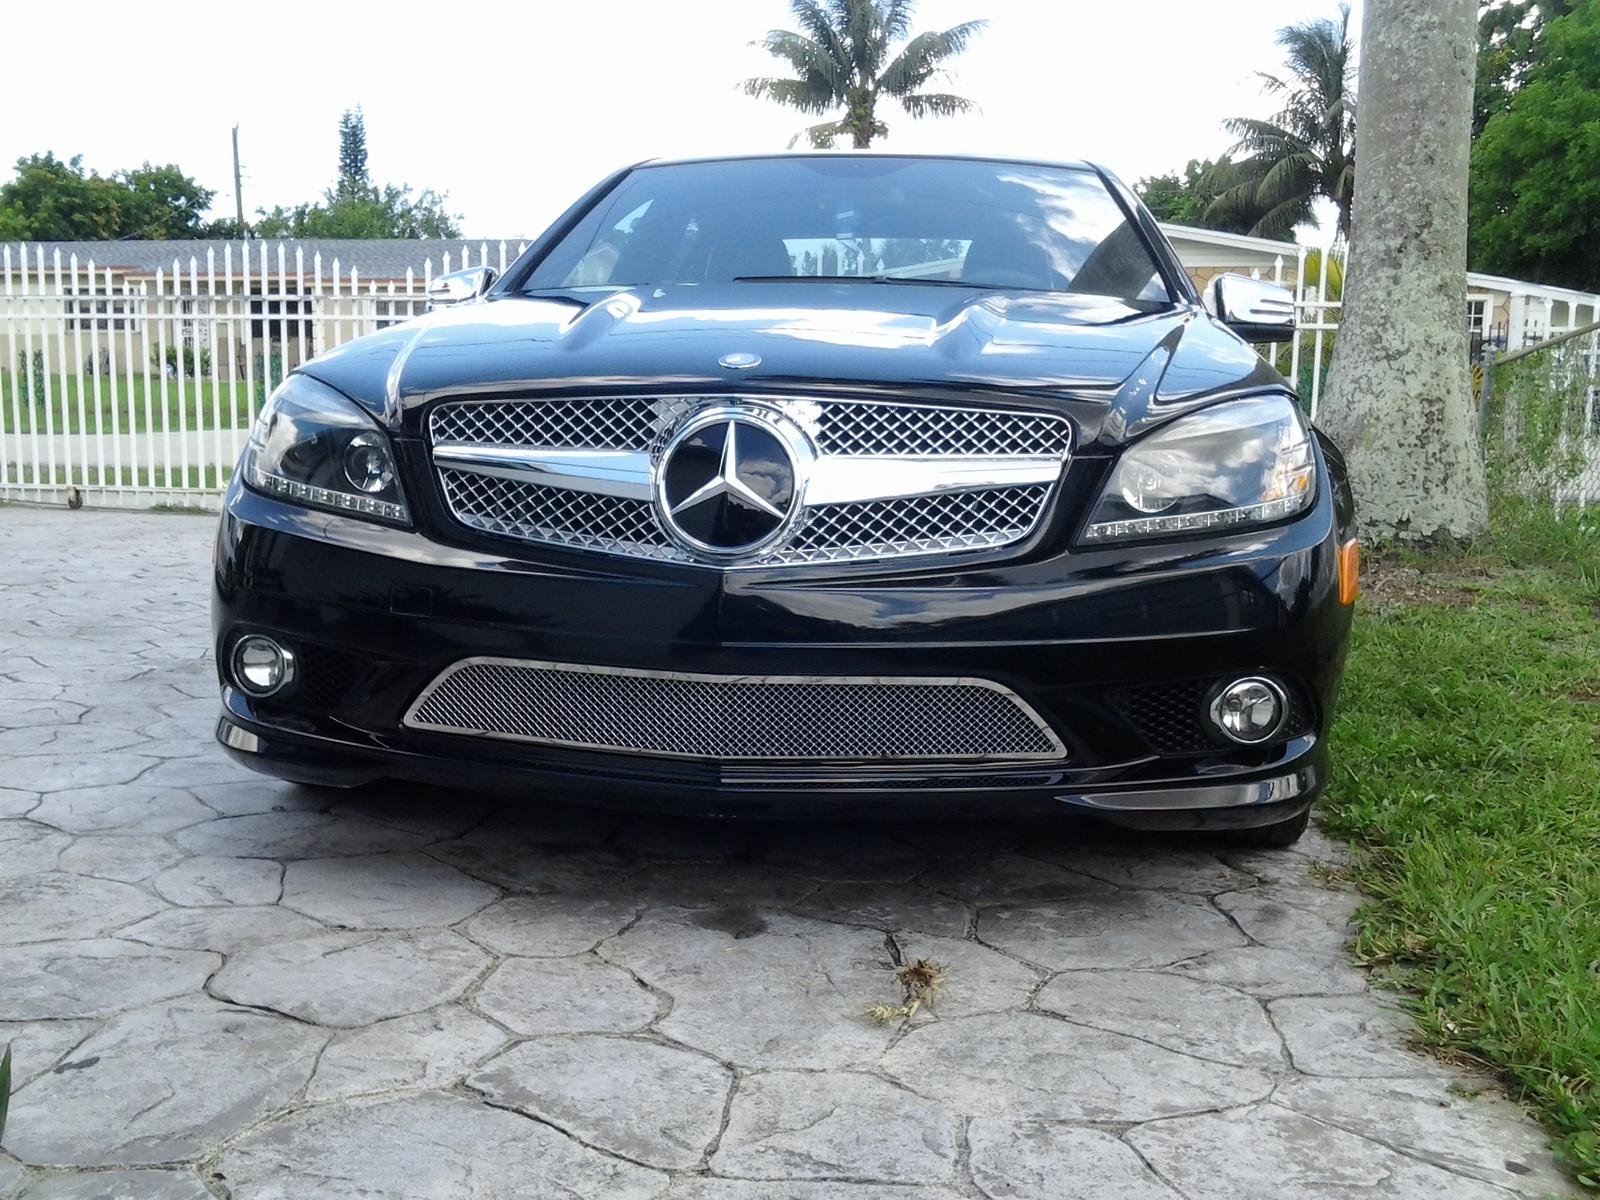 2010 mercedes benz c class pictures cargurus for Mercedes benz c300 luxury